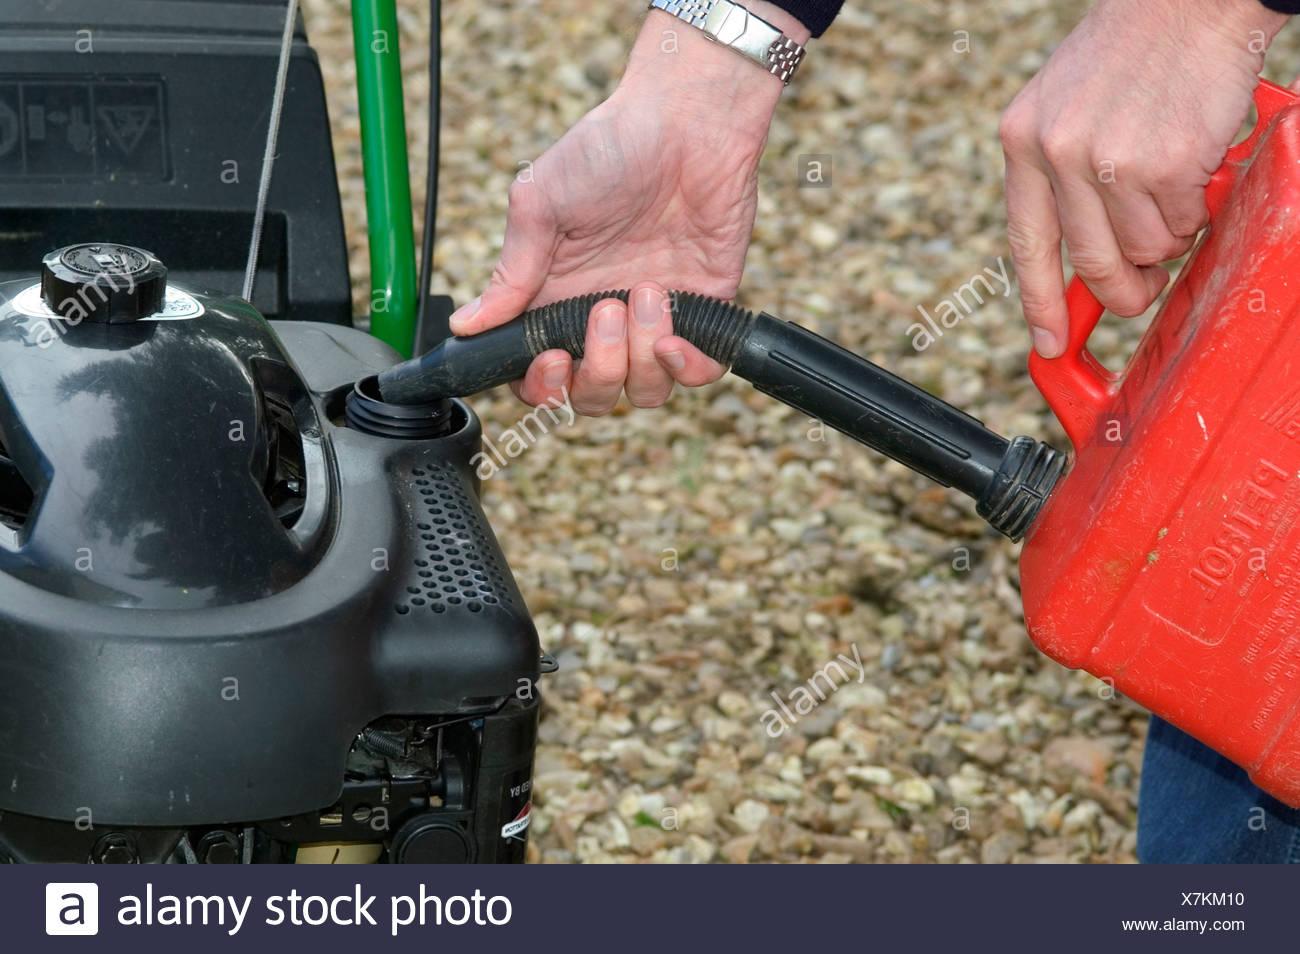 Filling petrol tank on petrol driven rotary mower - Stock Image